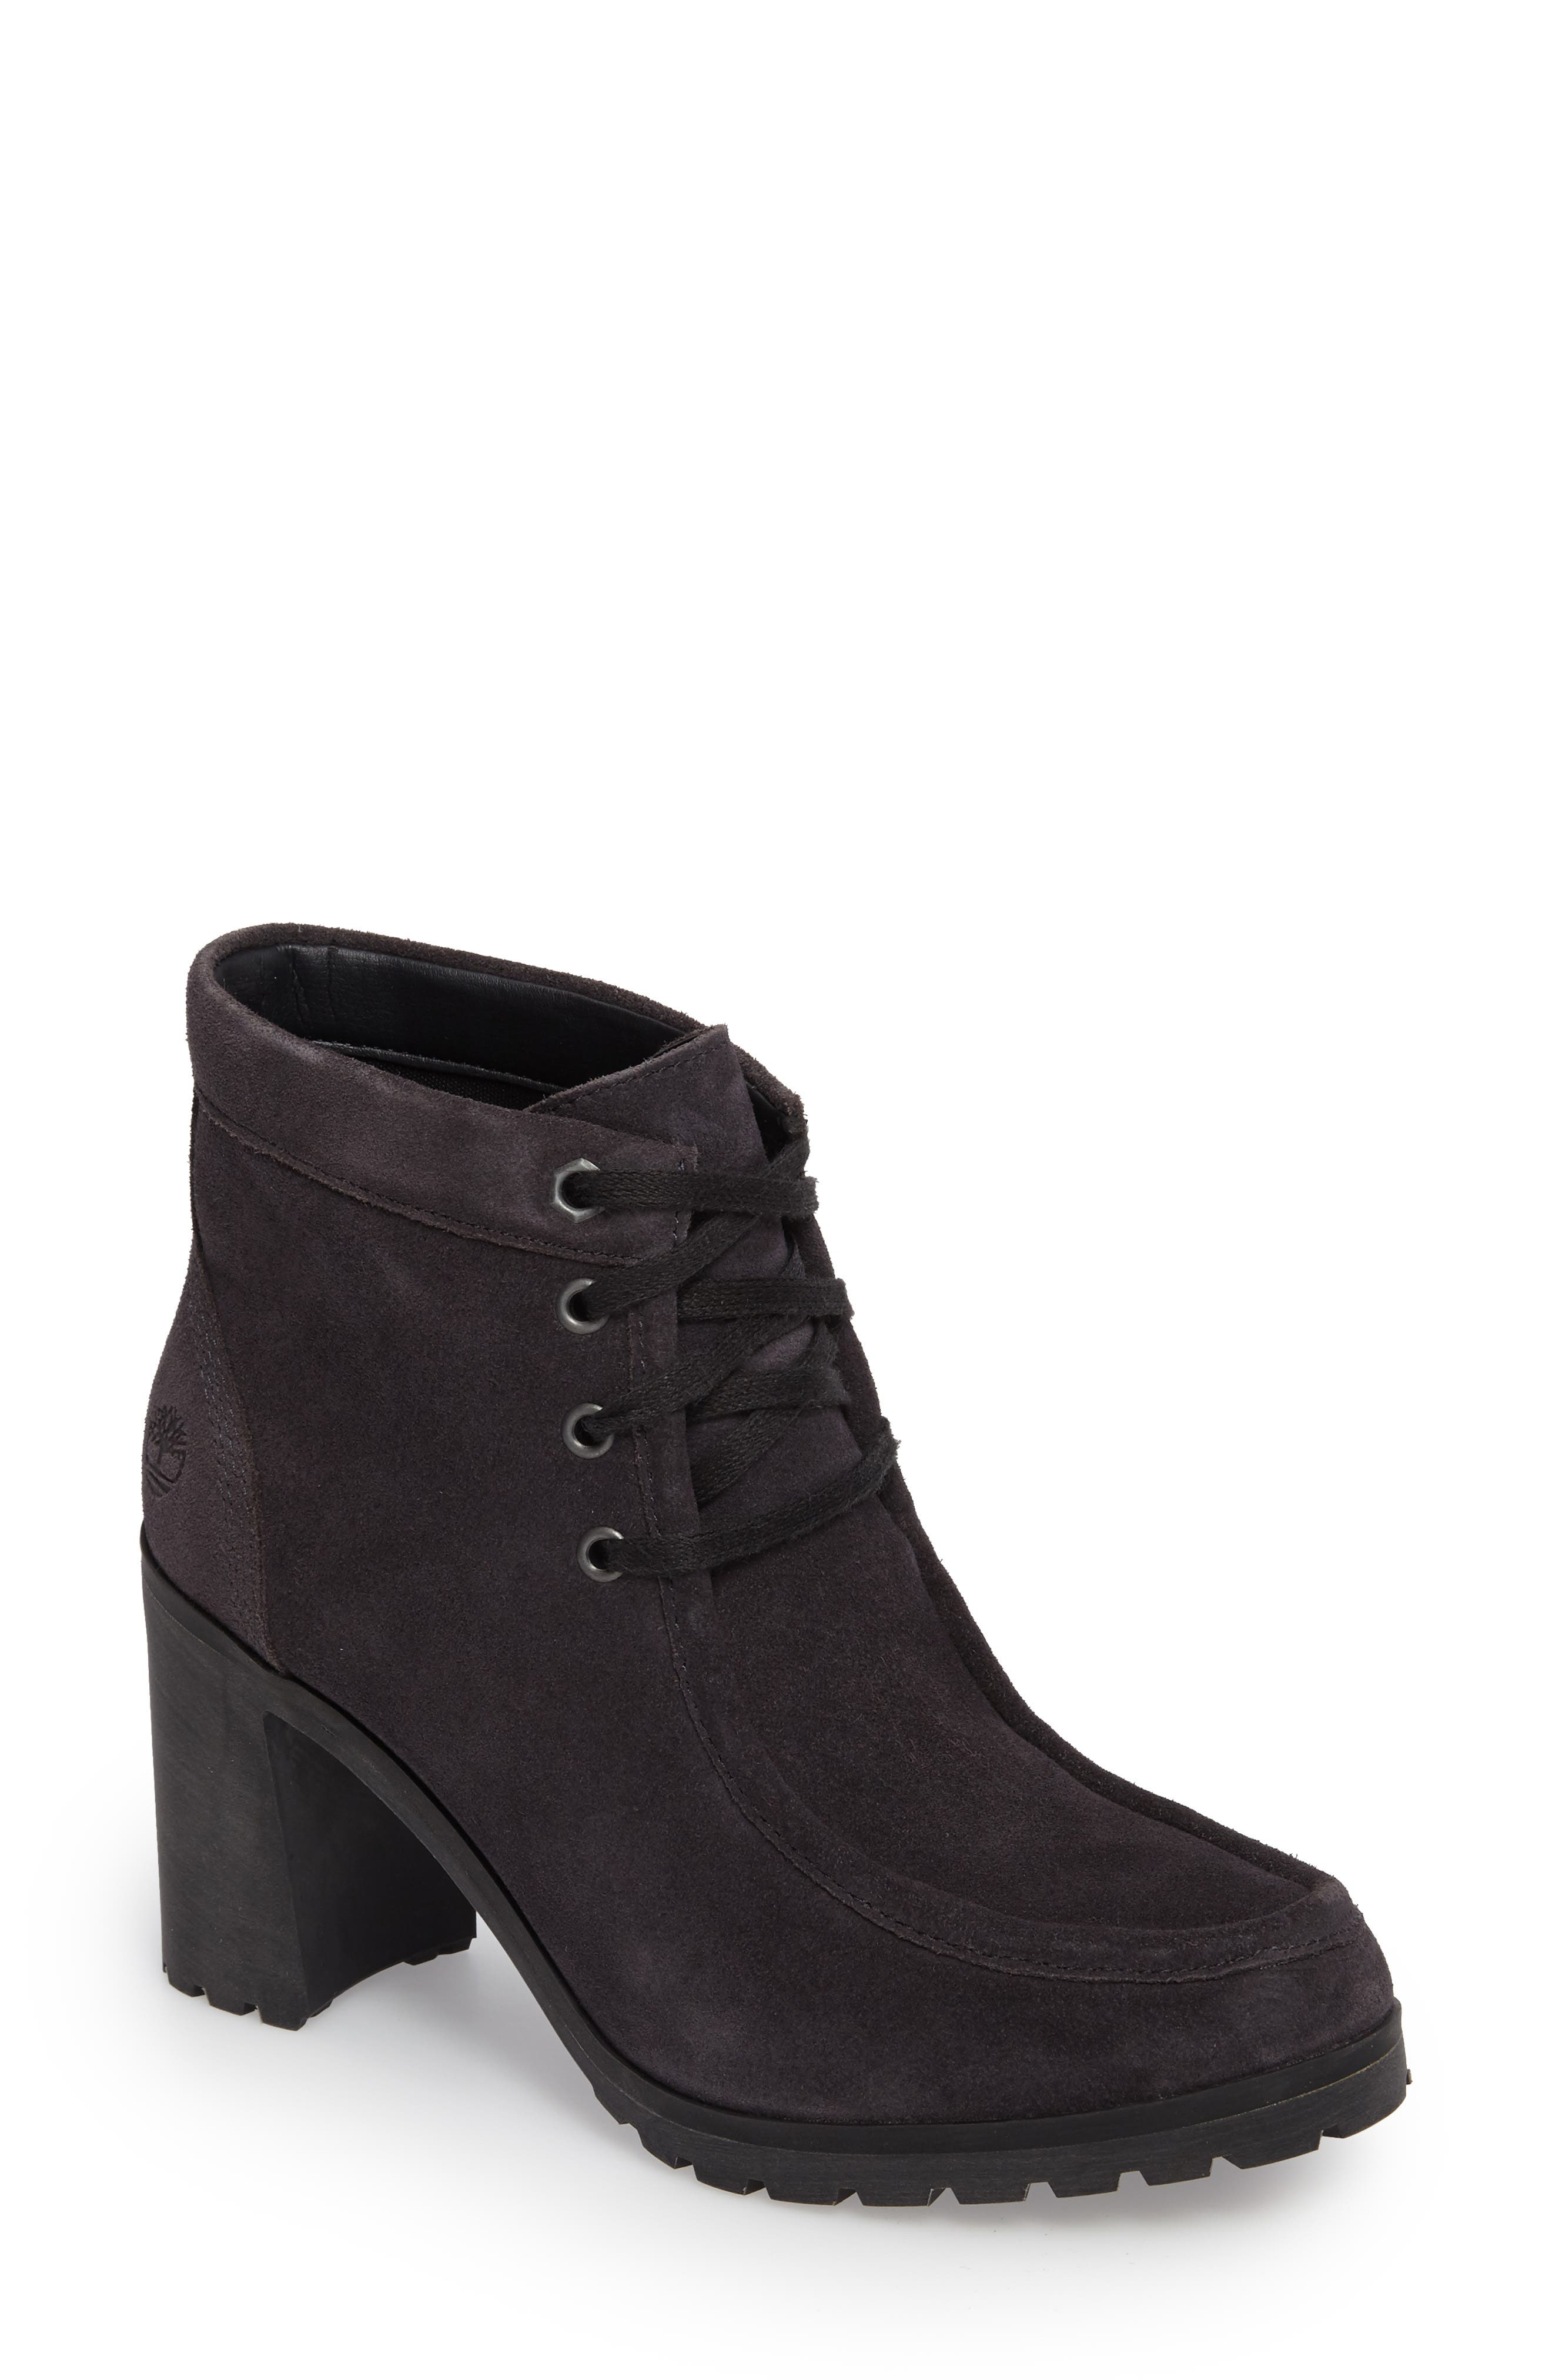 Timberland Allington Block Heel Chukka Bootie (Women)